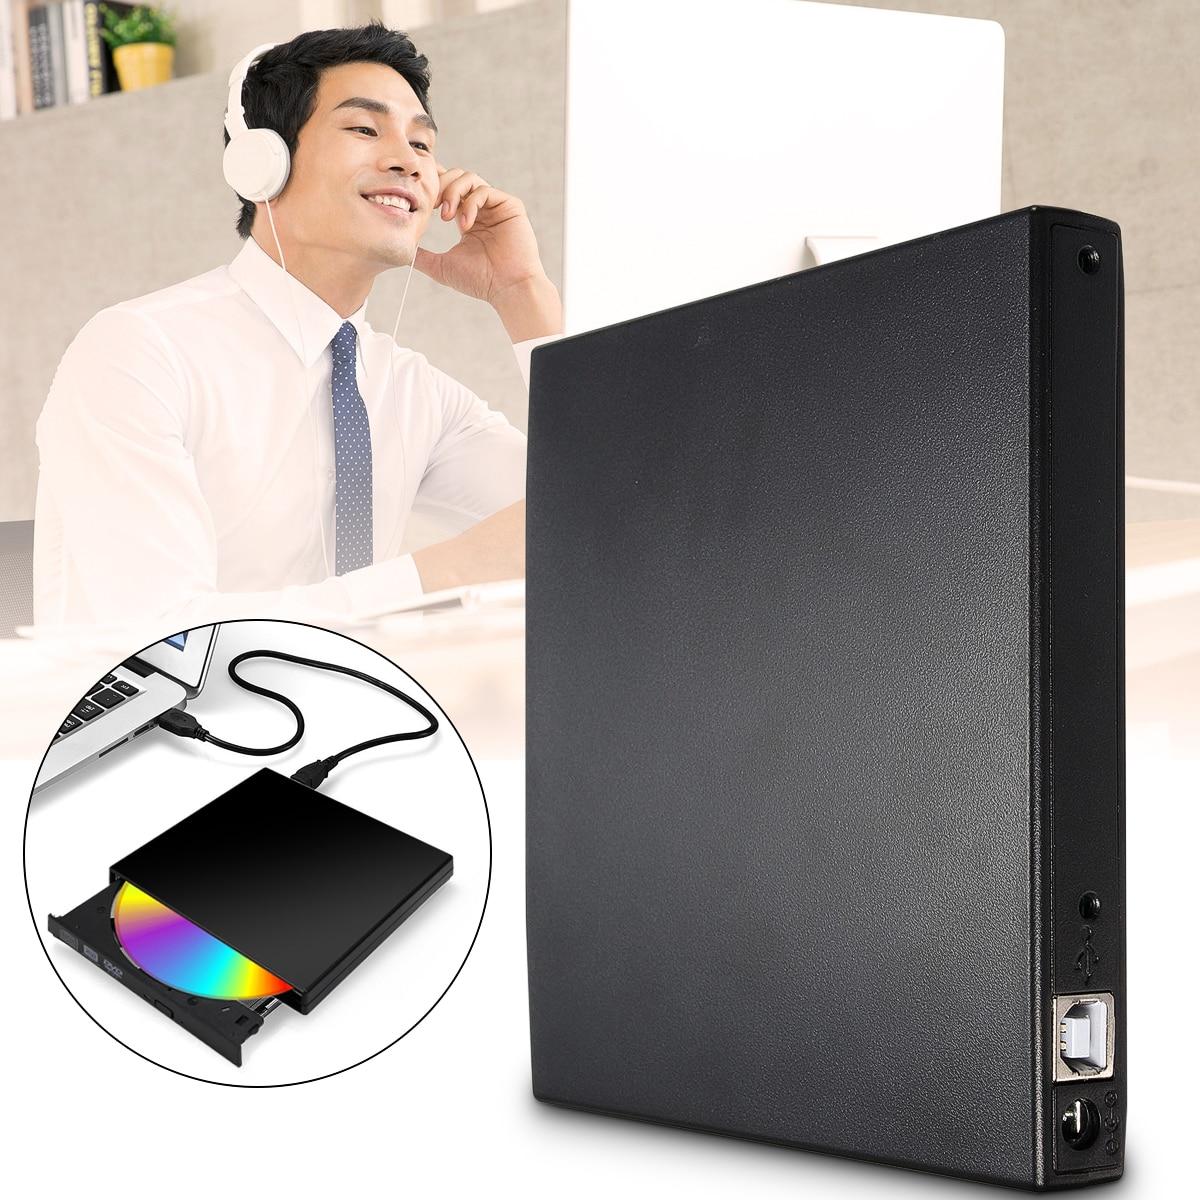 Chegada nova Tampa USB 2.0 DVD CD-Rom IDE DVD RW Burner ROM Caso Caixa Externa Caddy laptop Notebook IDE Interface